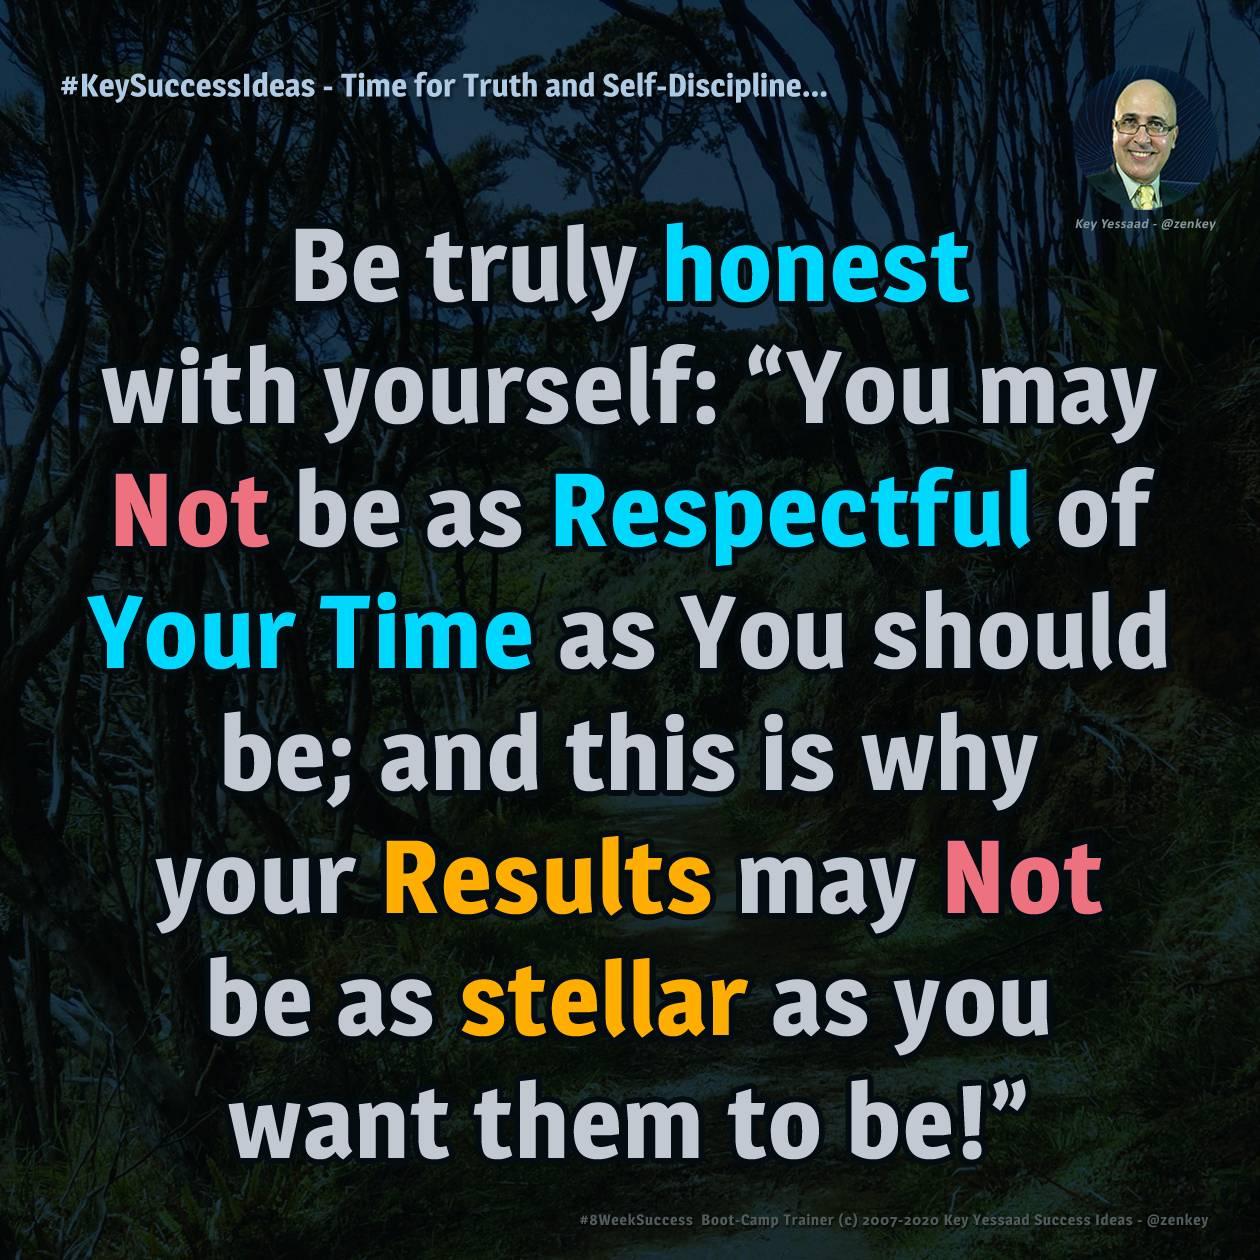 Time for Truth and Self-Discipline... - #KeySuccessIdeas